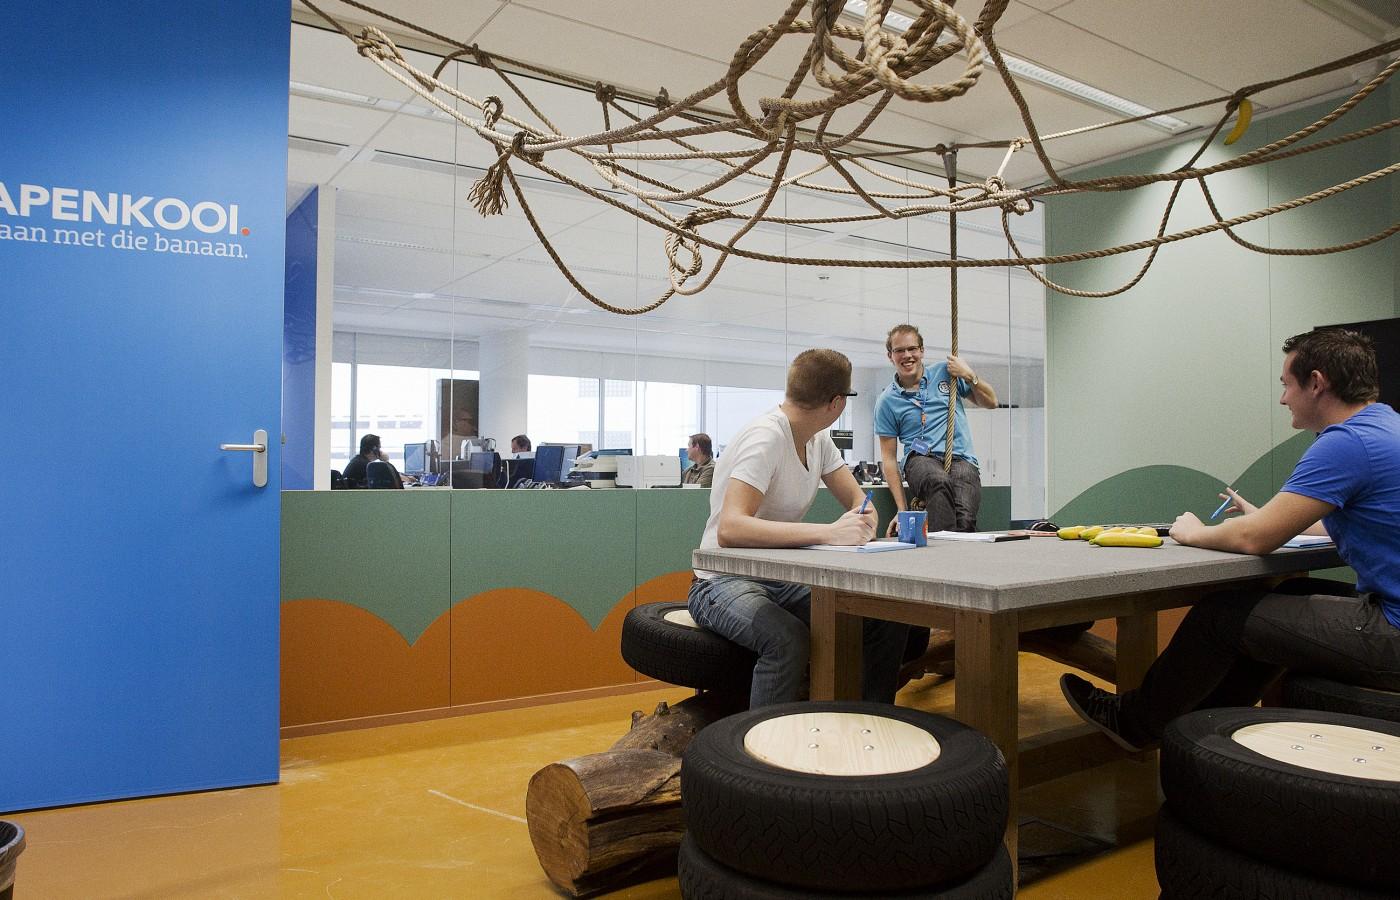 Neutrale Interieur Inrichting : Interieur coolblue rotterdam siebold nijenhuis architecten sna